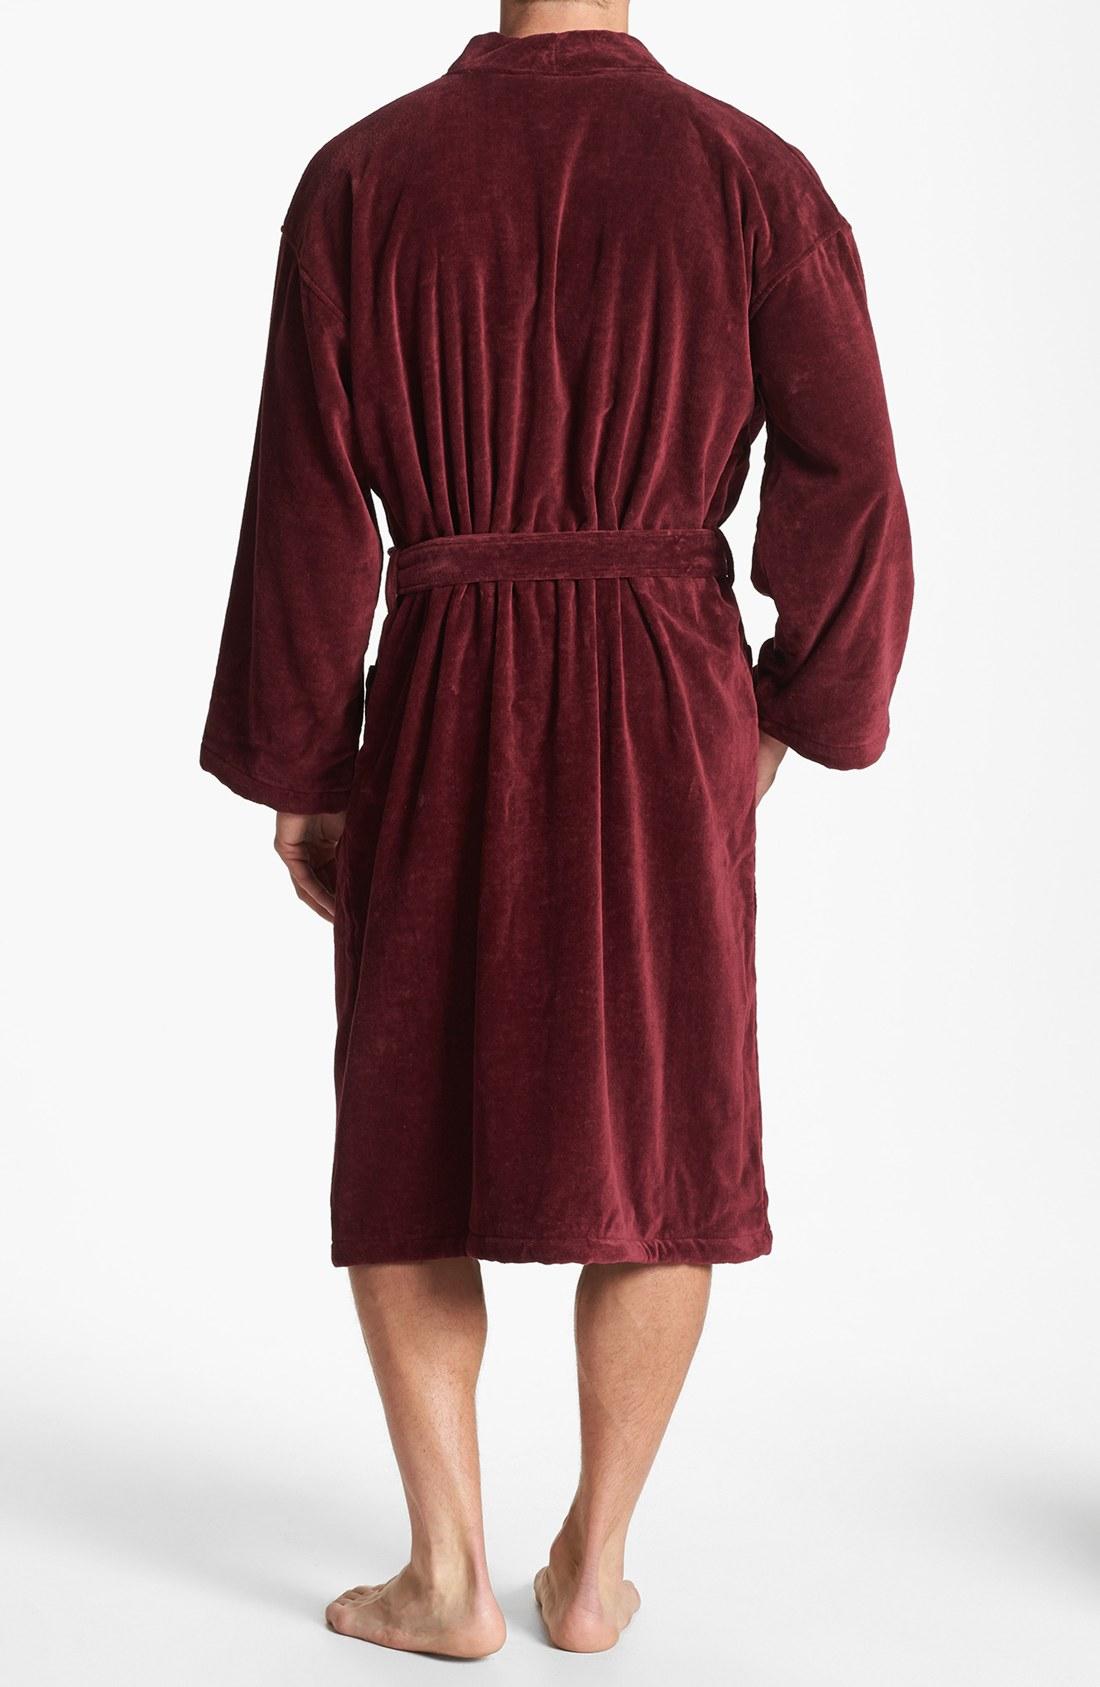 lyst polo ralph lauren velour kimono robe in red for men. Black Bedroom Furniture Sets. Home Design Ideas